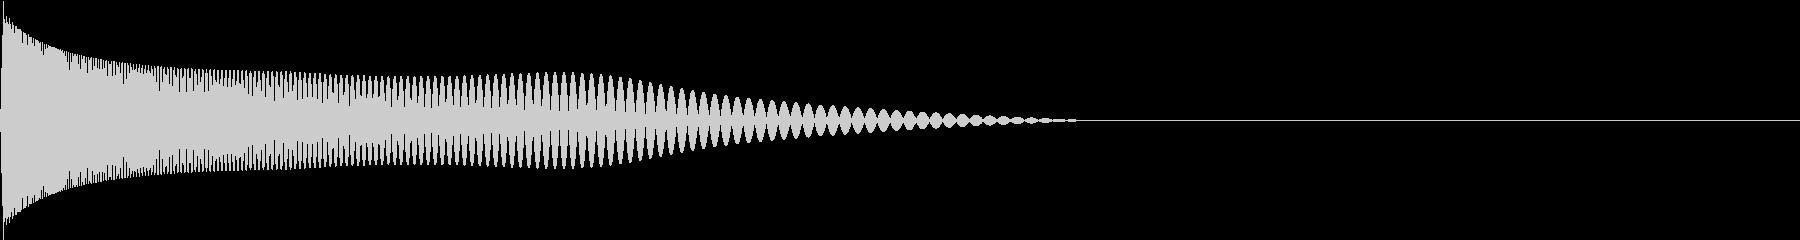 Retro ゲームのアタック音 1の未再生の波形